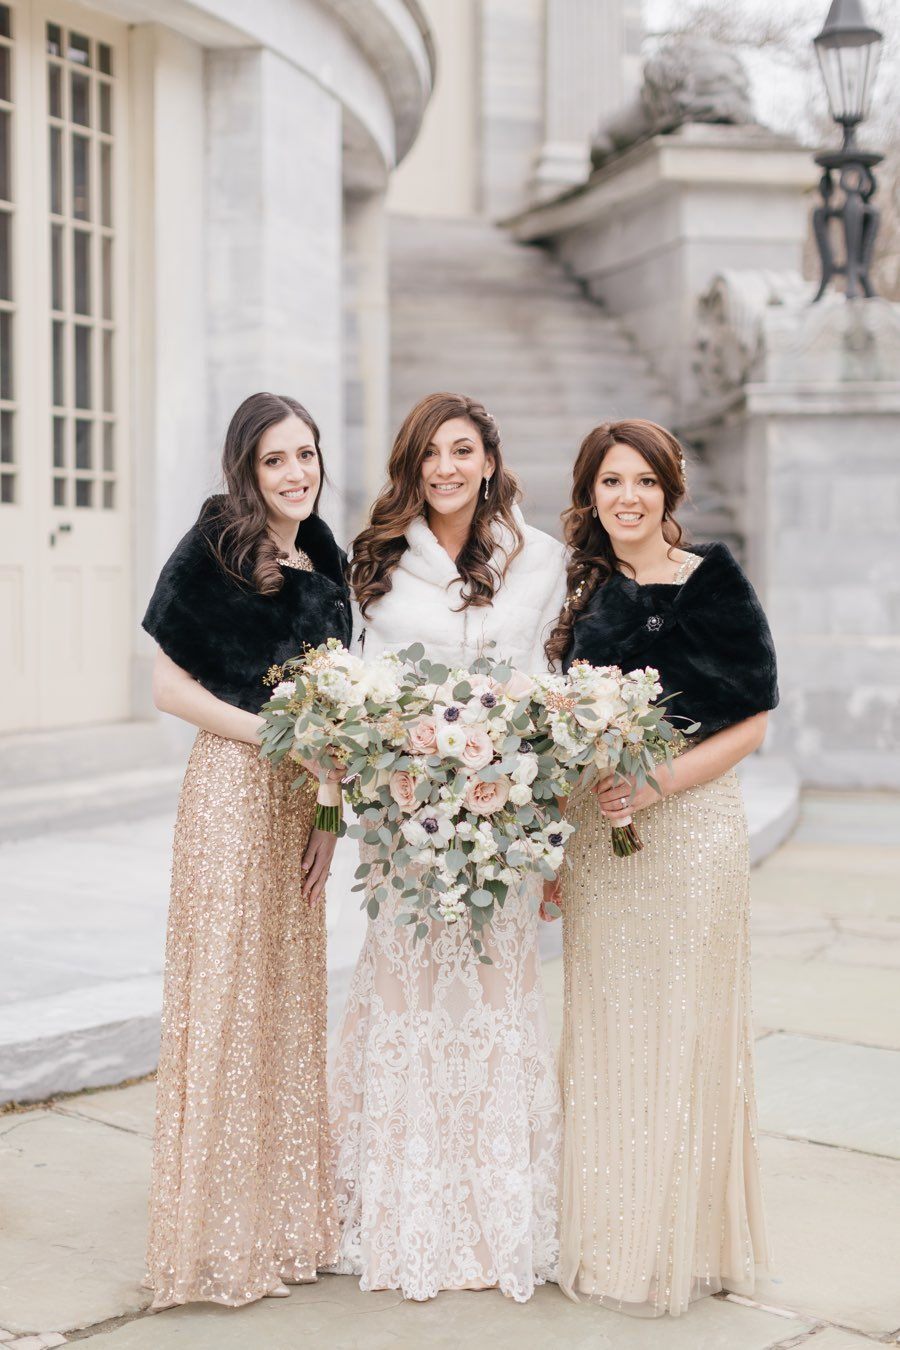 gold-sequin-bridesmaid-dresses-winter